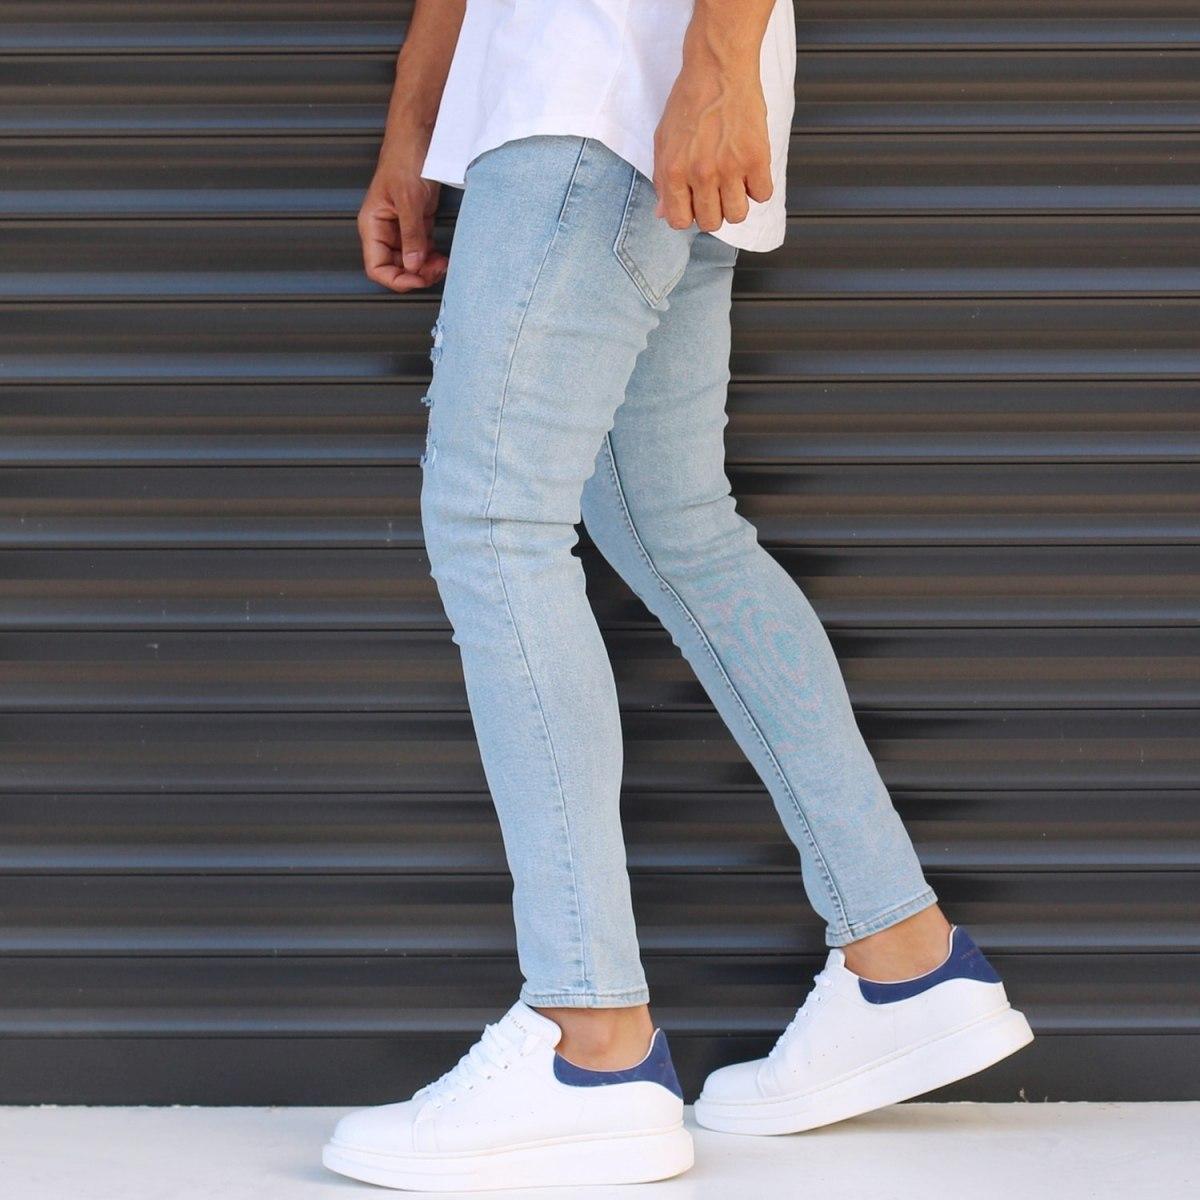 Men's Narrow Jeans With Thin Rips In Denim Blue Mv Premium Brand - 3